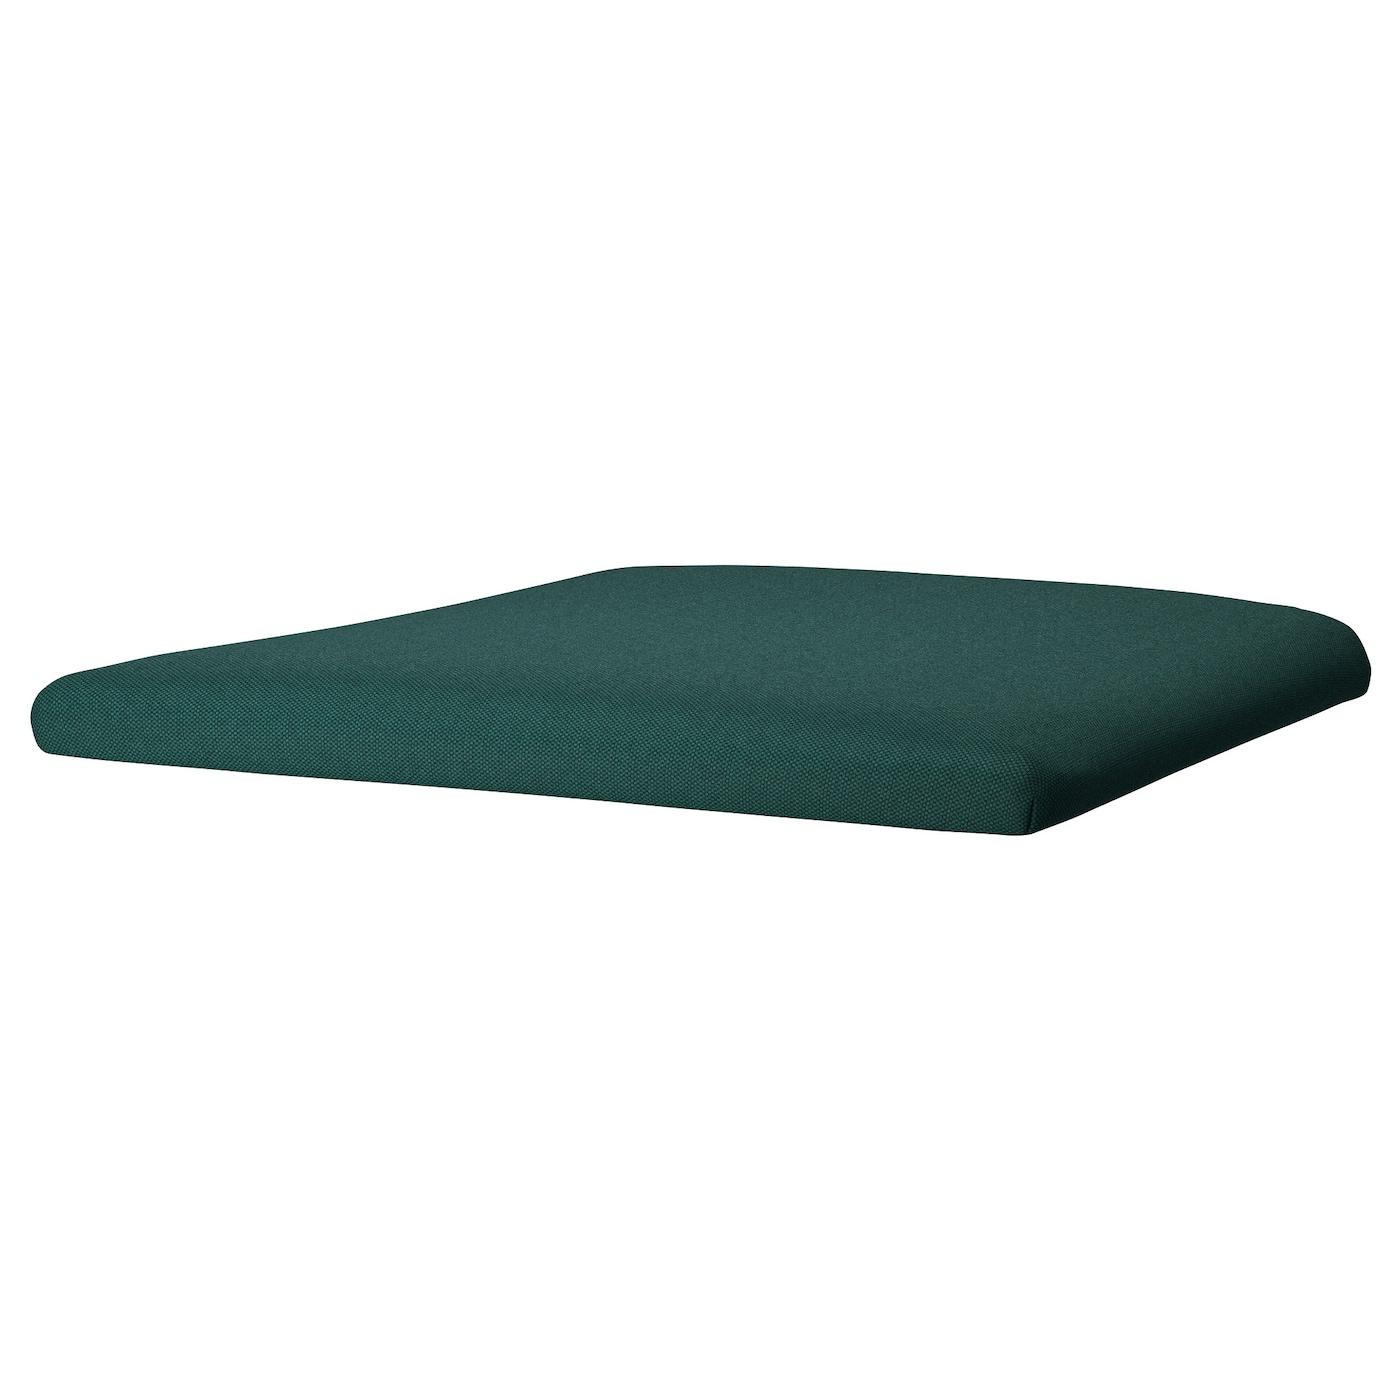 ekedalen stoelovertrek gunnared donkergroen ikea. Black Bedroom Furniture Sets. Home Design Ideas